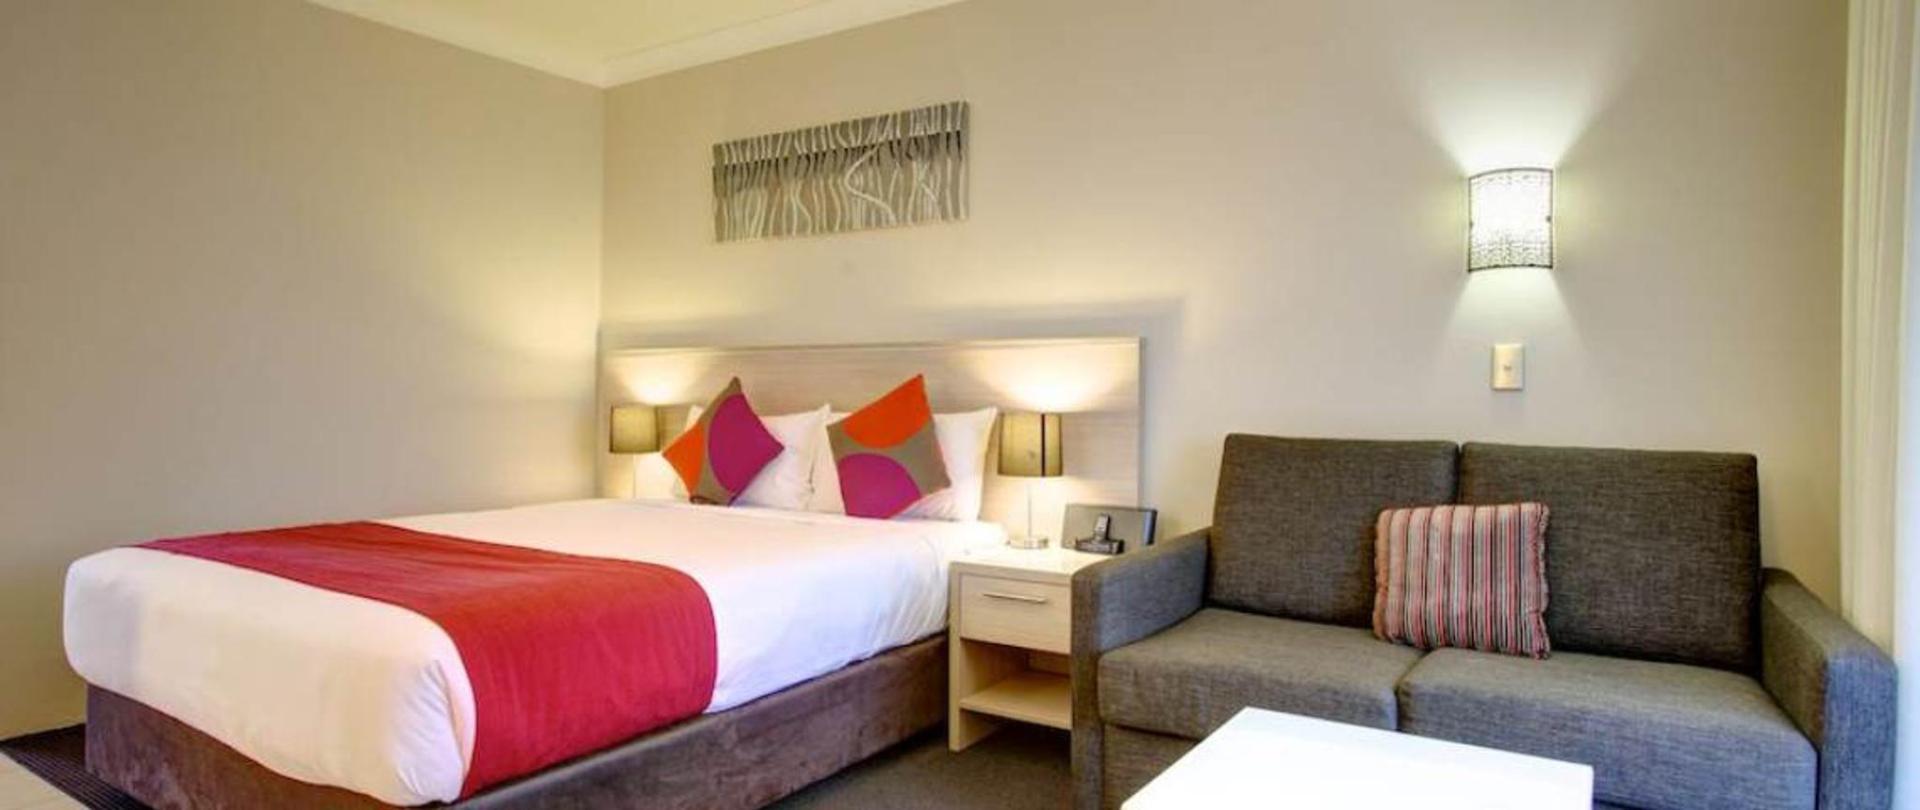 quality-inn-hotel-style.jpg.1140x481_default.jpg